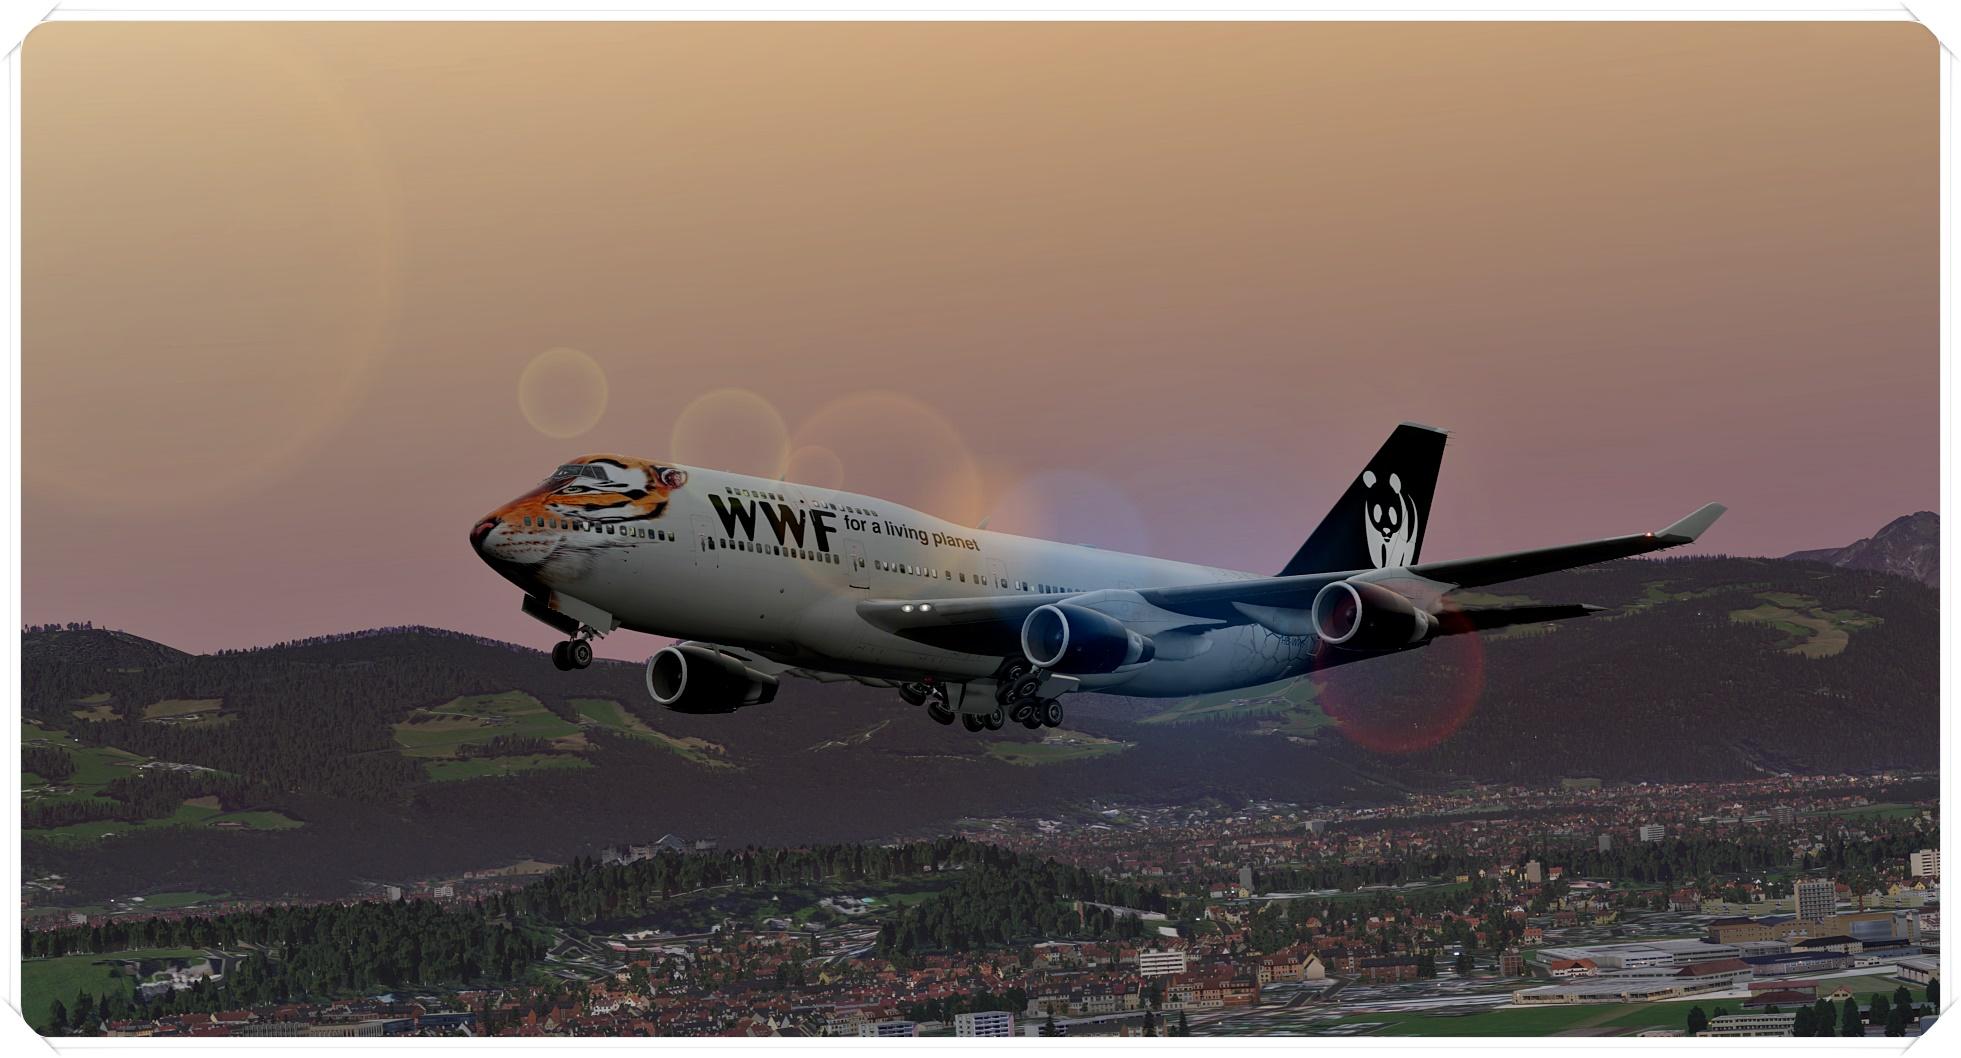 747-400_84jrnq.jpg